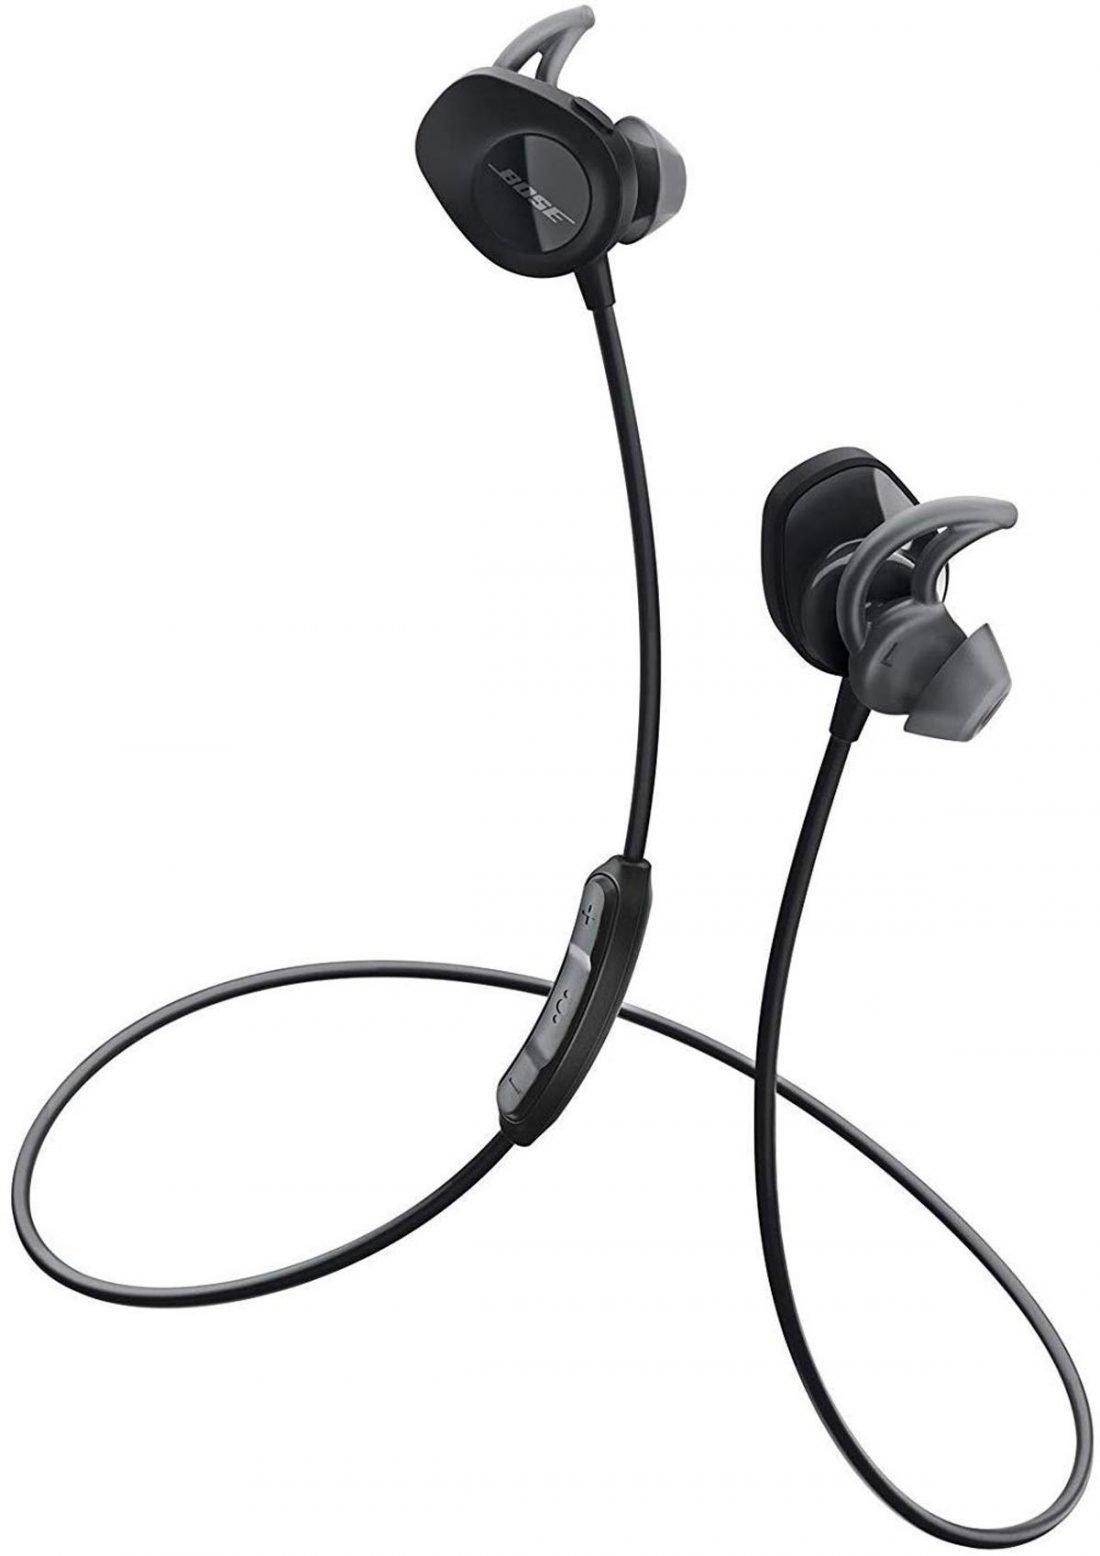 SoundSport Wireless Headphones (From: Amazon)